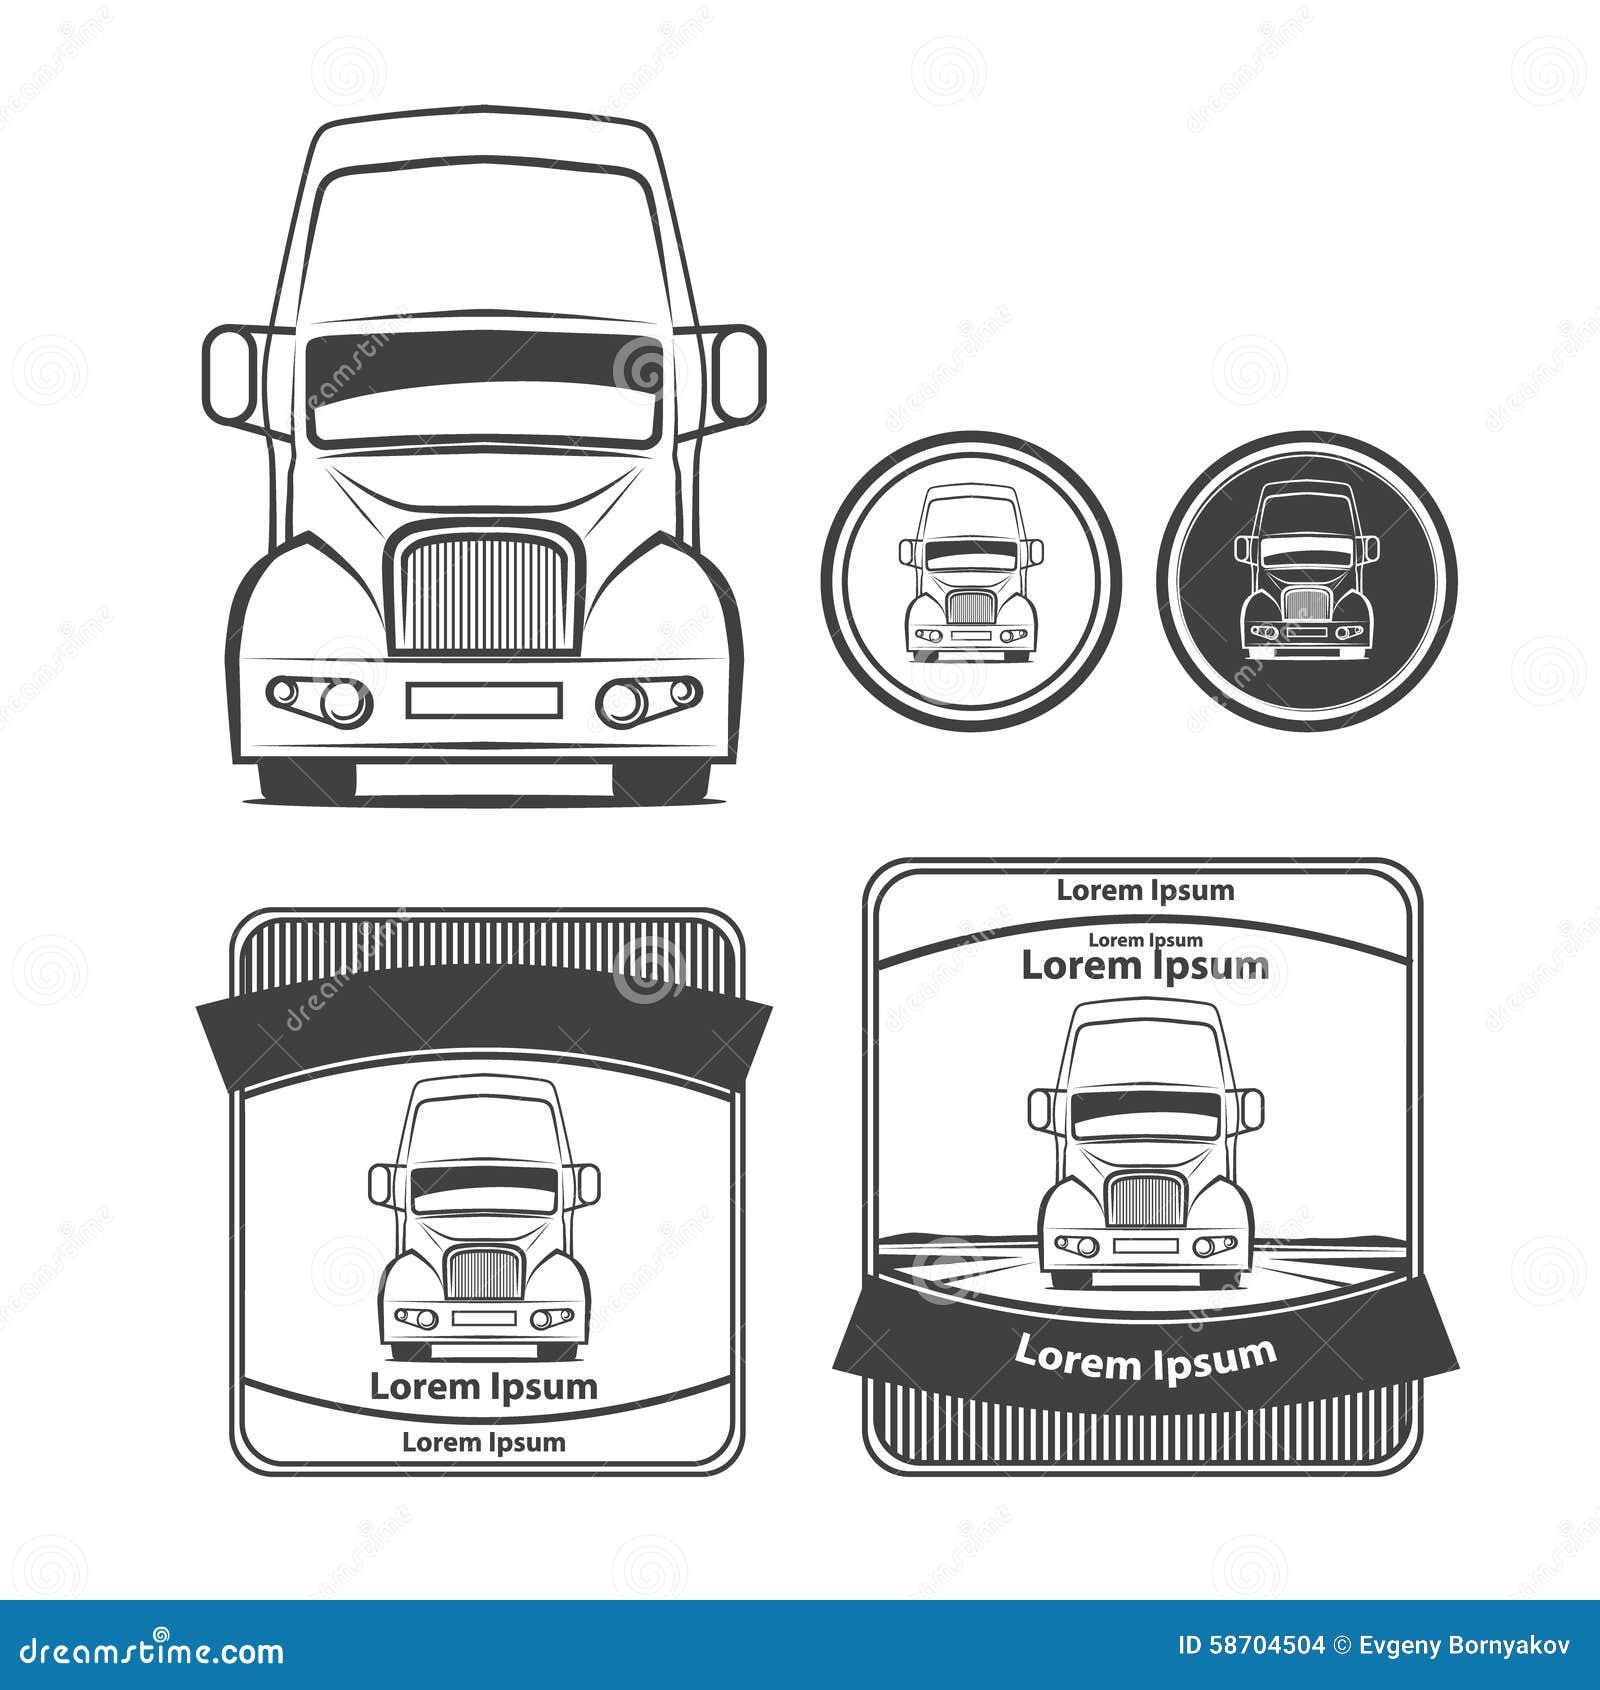 Truck7 Stock Vector - Image: 58704504